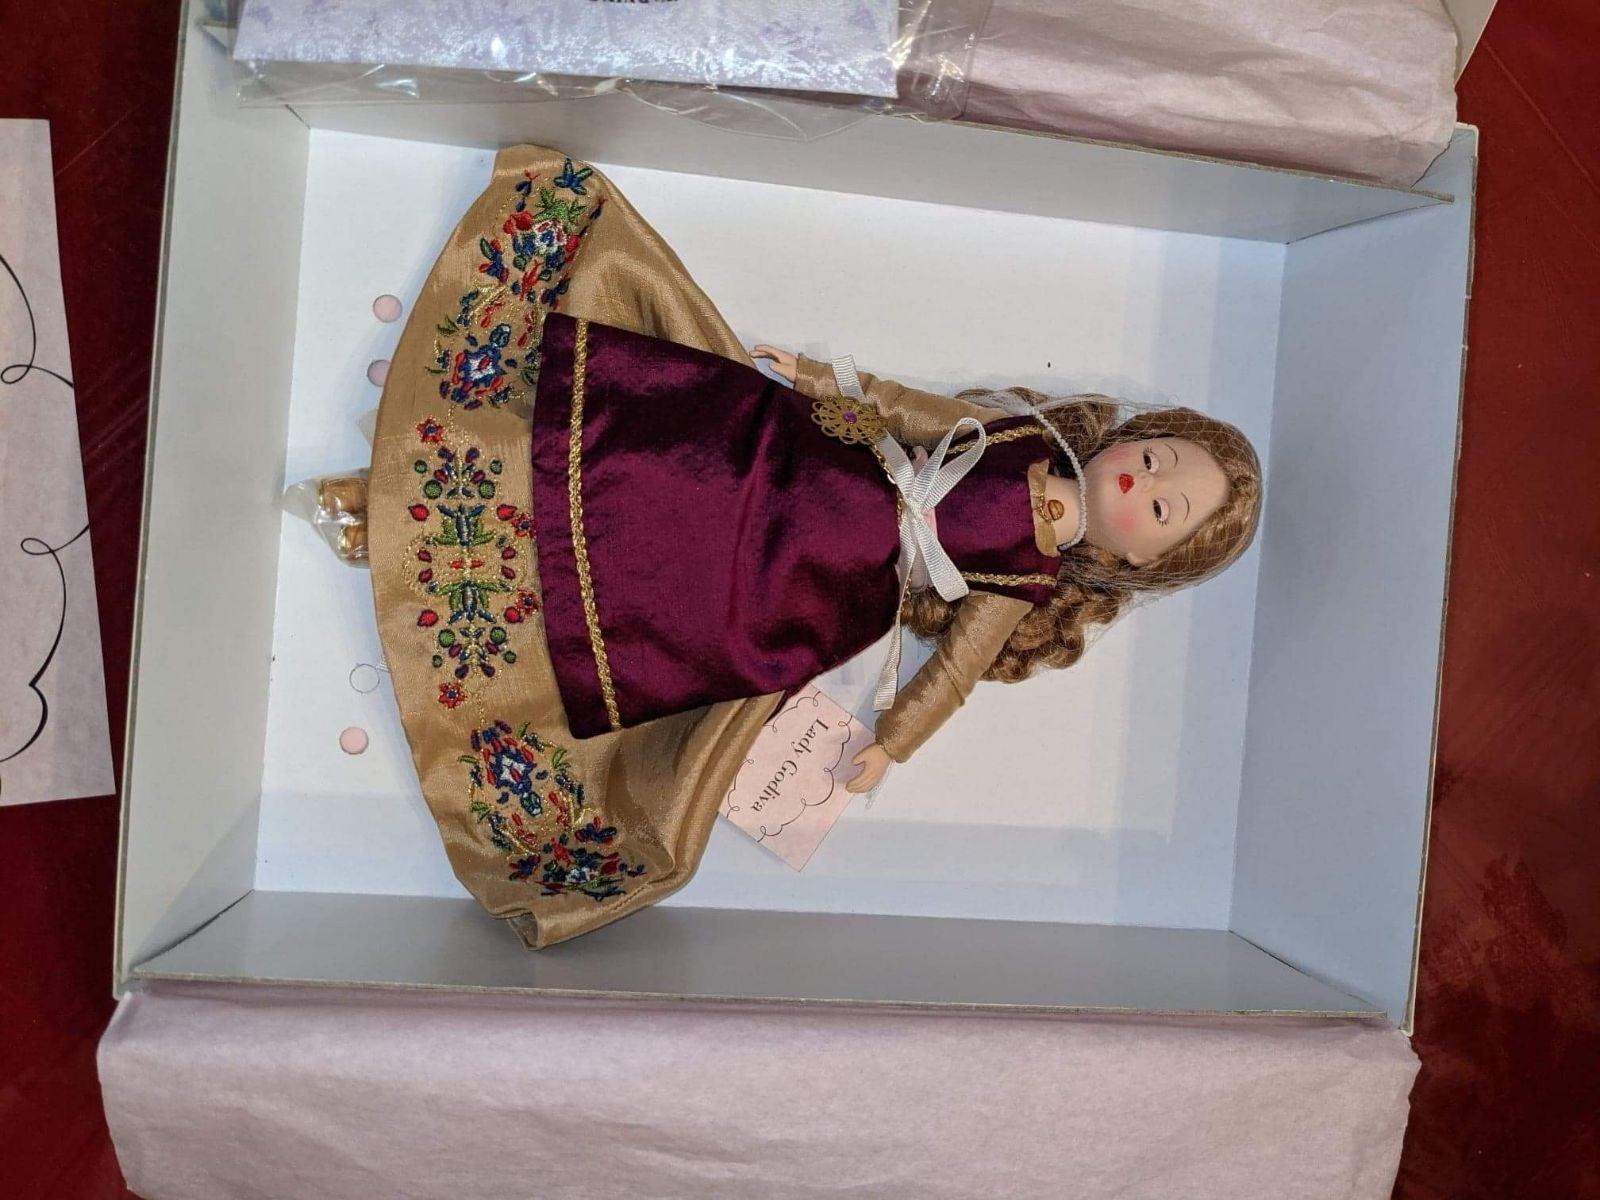 Madame alexander lady godiva 315/750